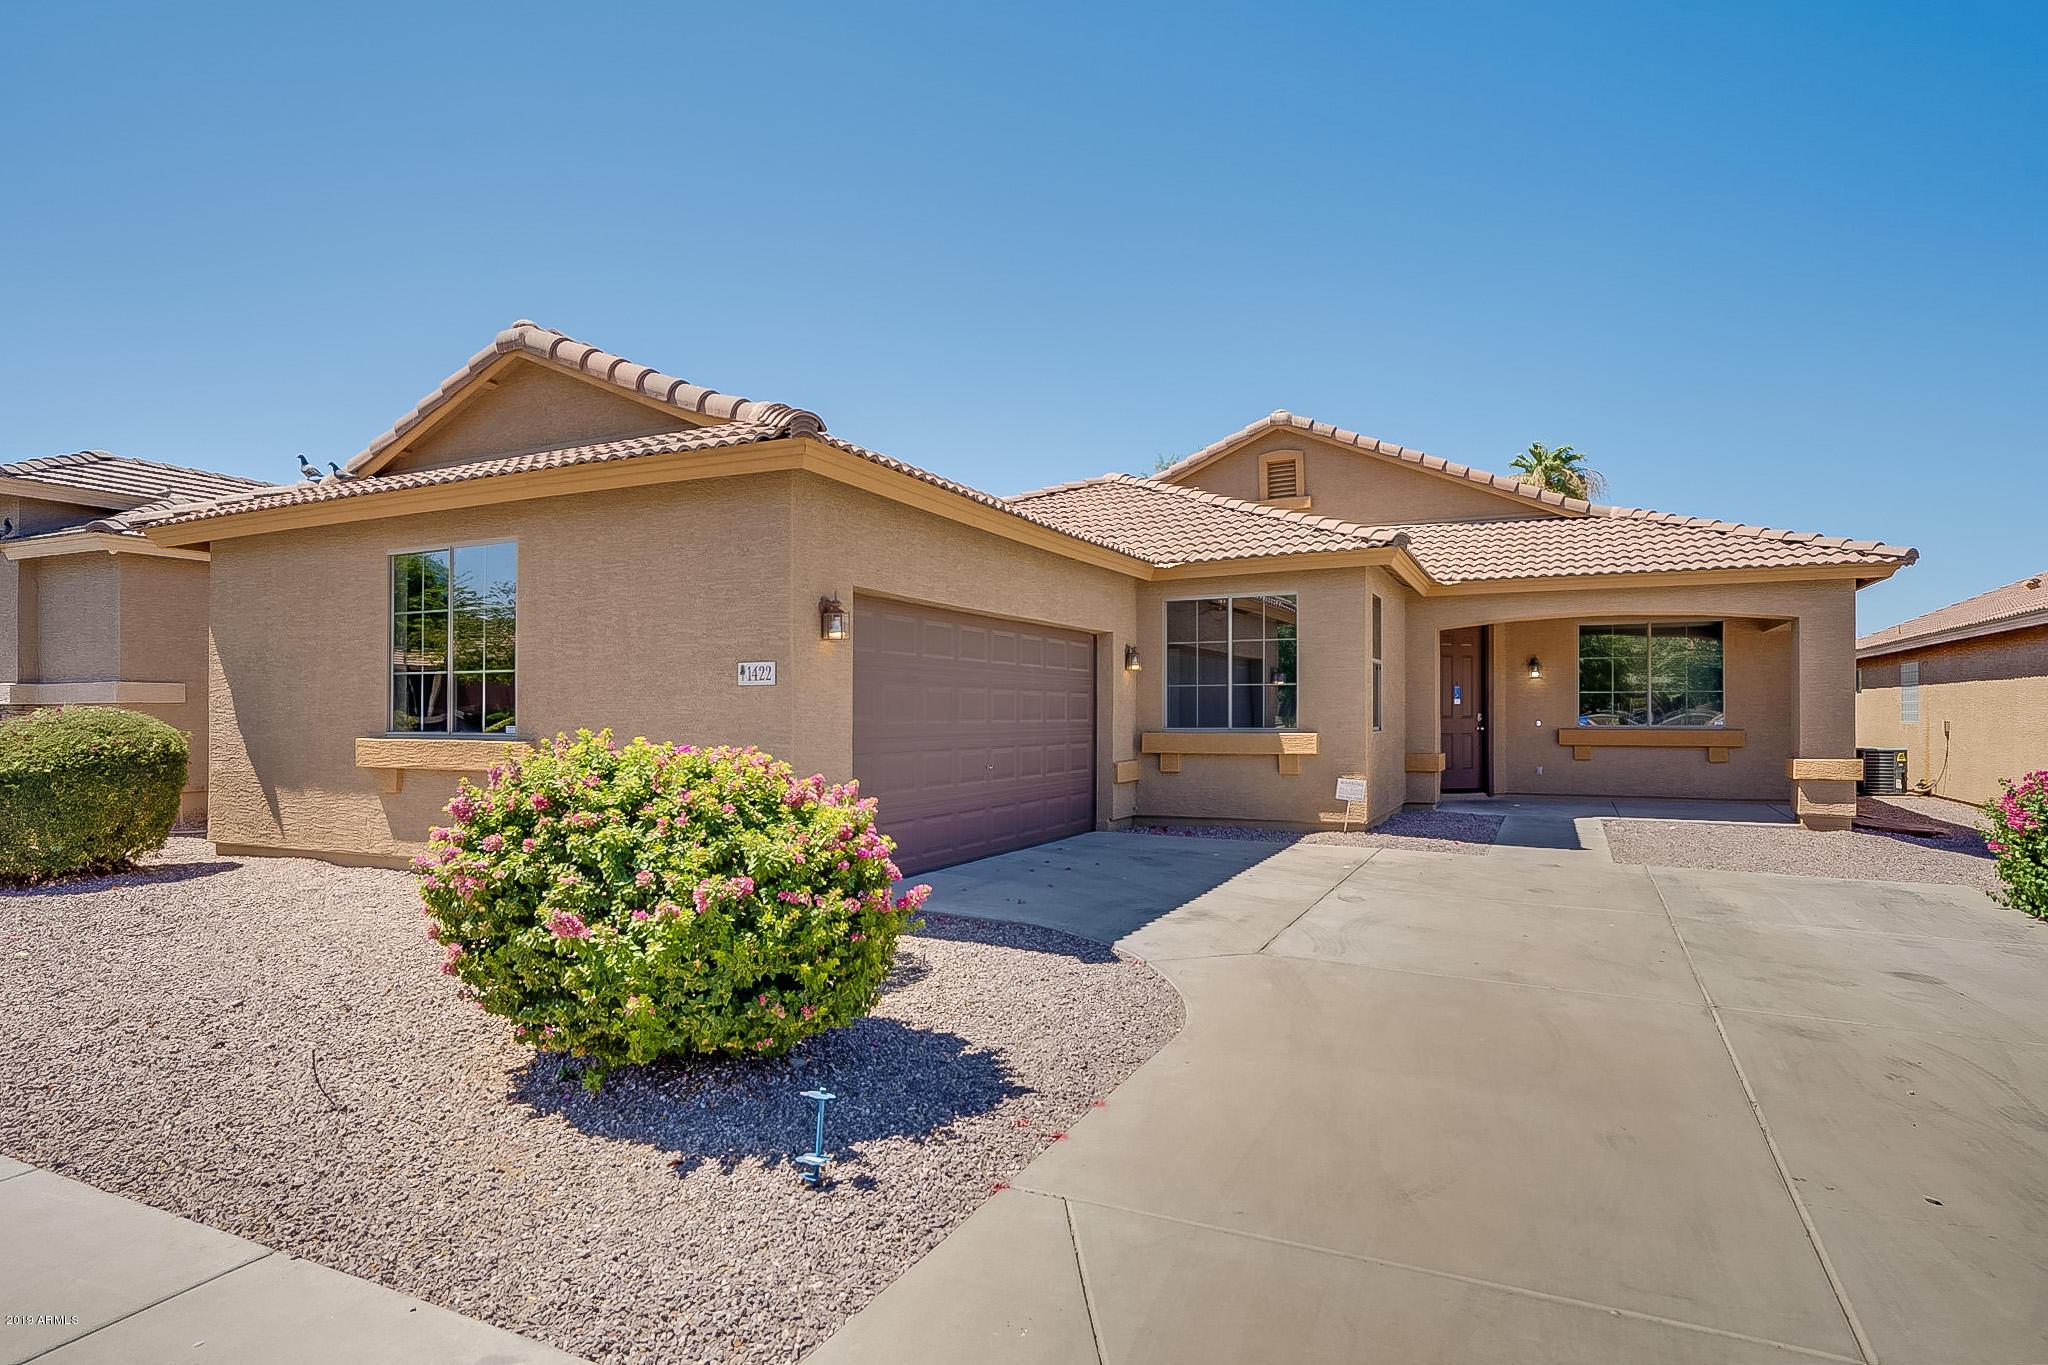 Photo of 1422 E GARY Way, Phoenix, AZ 85042